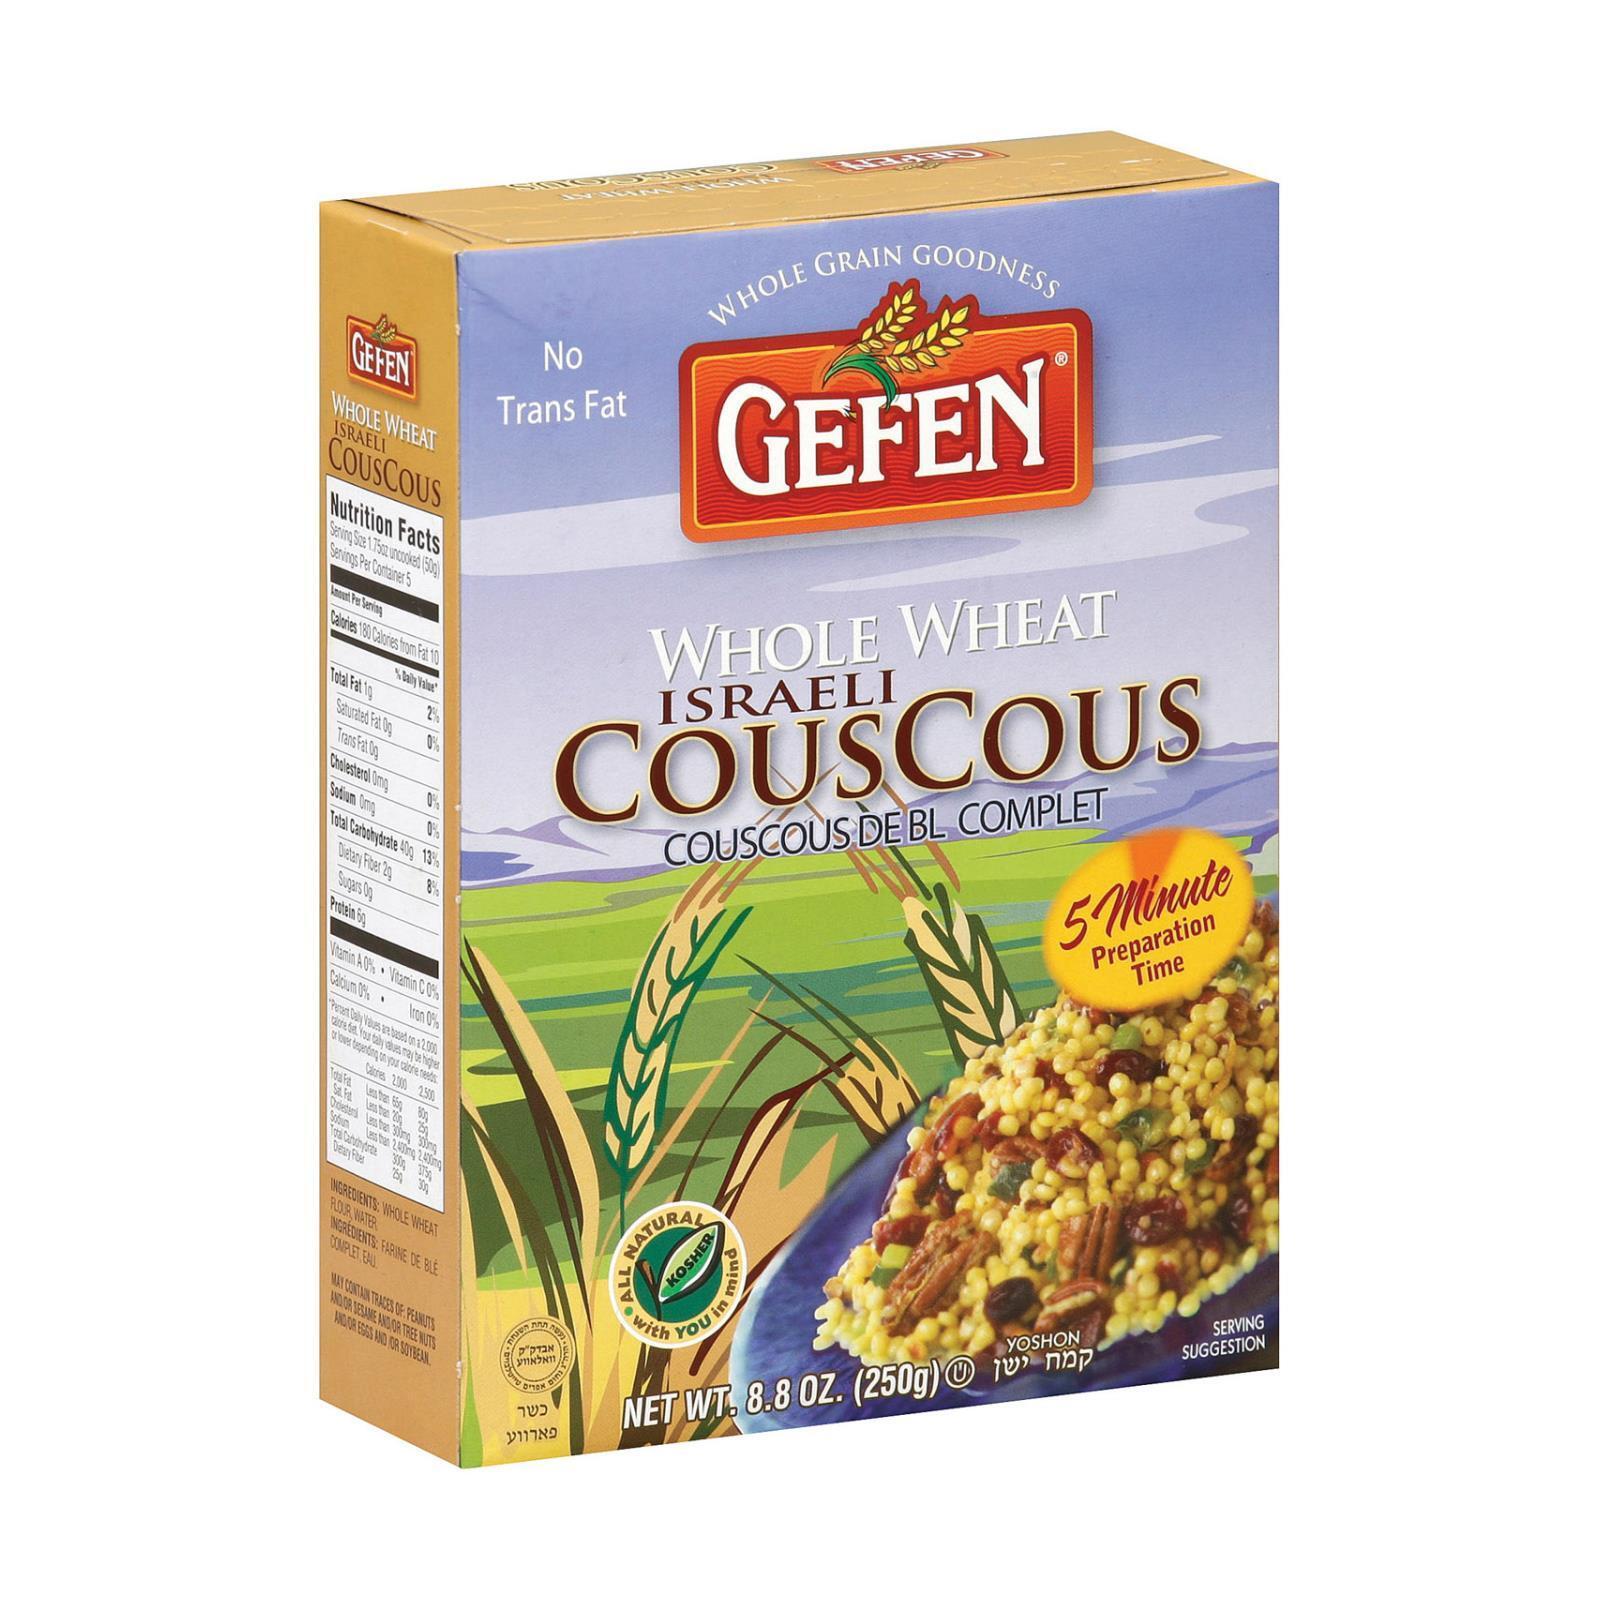 Gefen Couscous - Whole Wheat - Israeli - Case of 12 - 8.8 oz